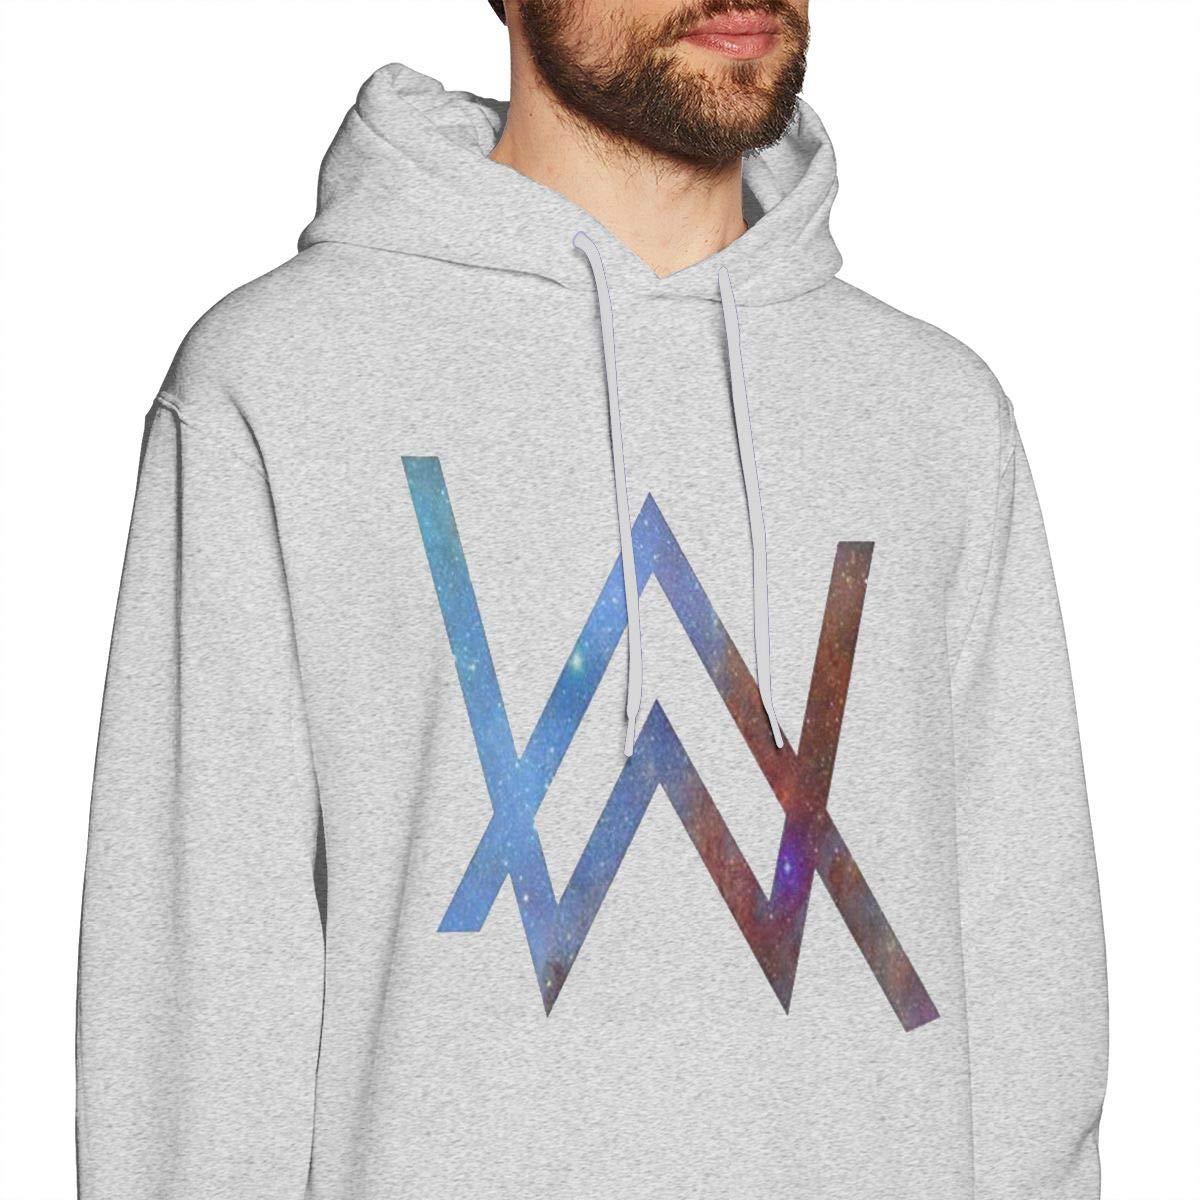 Mens Hooded Sweatshirt Alan Walker Nordic Winter Personality Wild Lion Head Gray